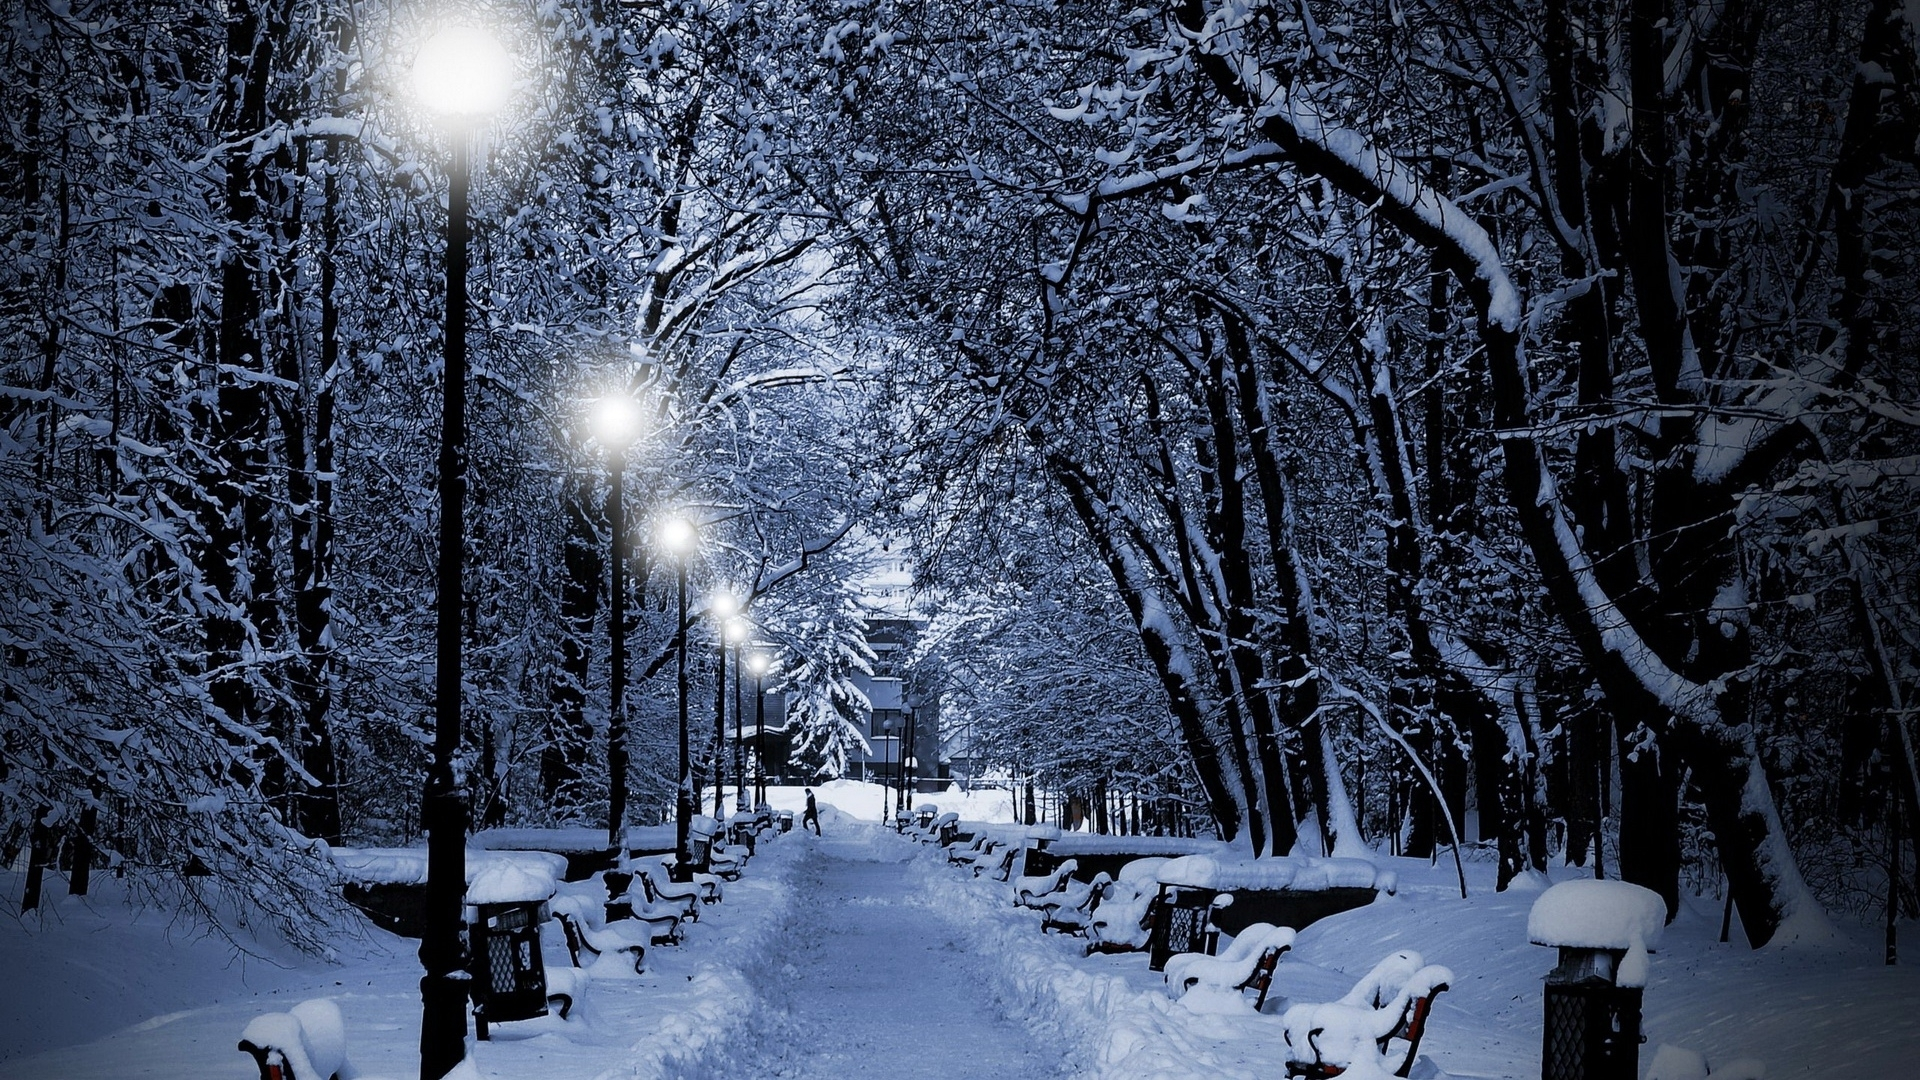 download wallpaper 1920x1080 park, winter, twilight, lamps, light